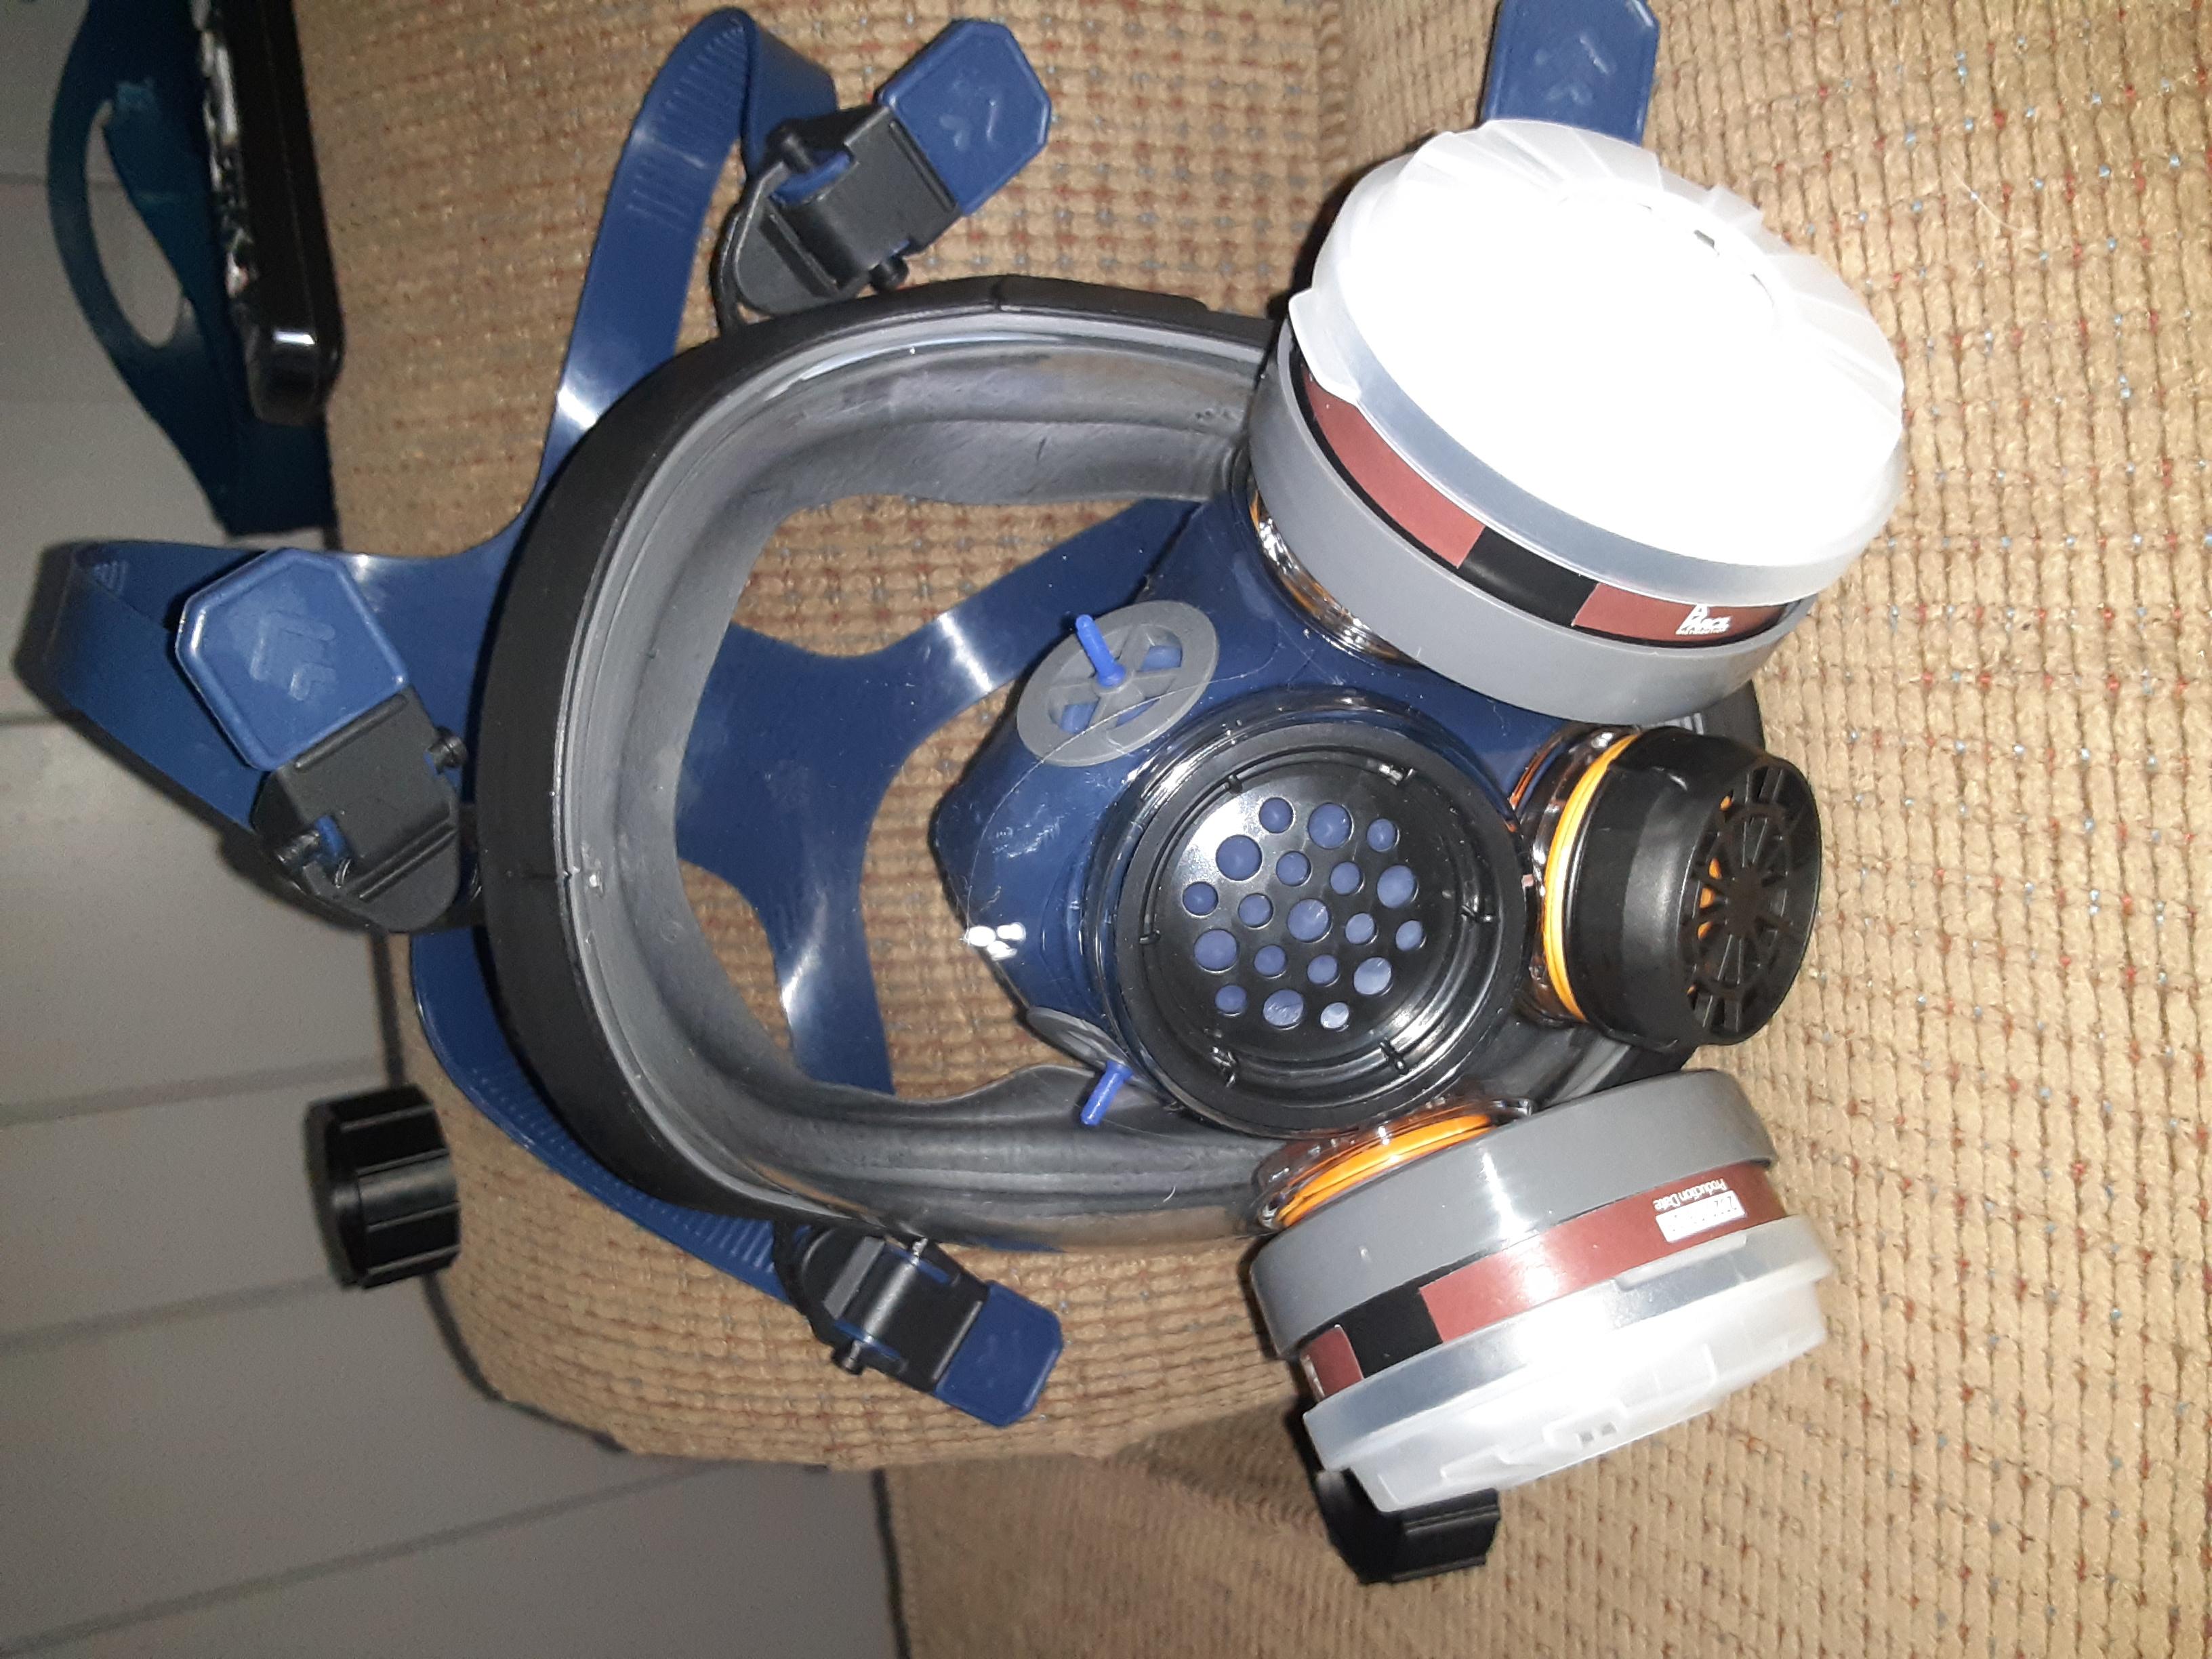 PD-100 full face respirator filter swap.-20200718_205606_1595120500192.jpg